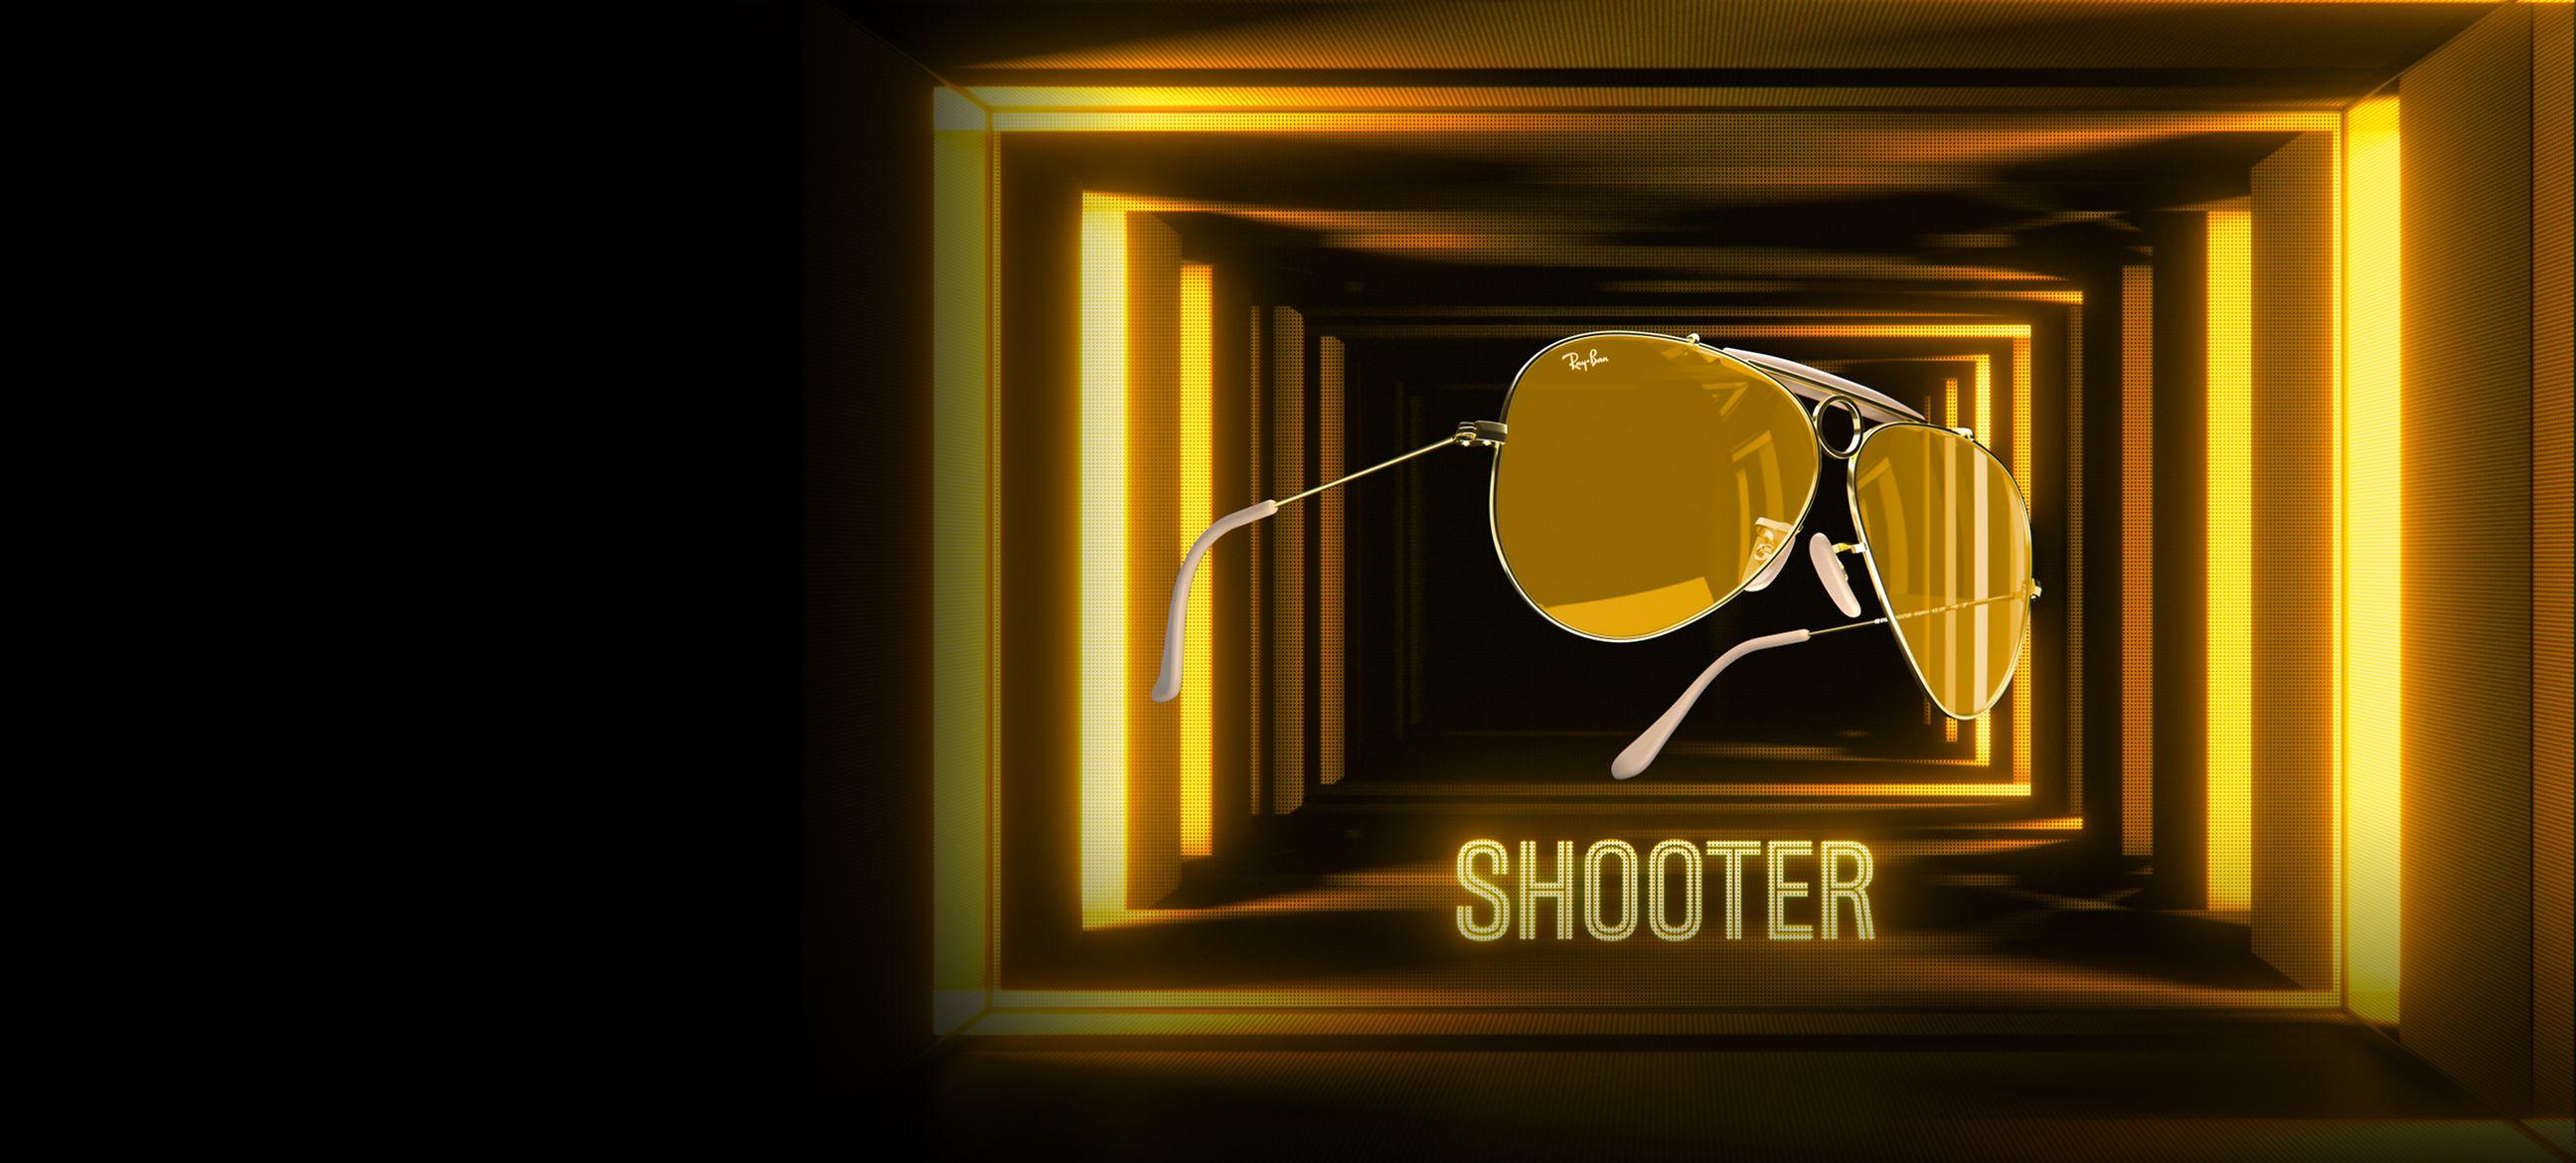 Shooter Ambermatic Ray-Ban Limited